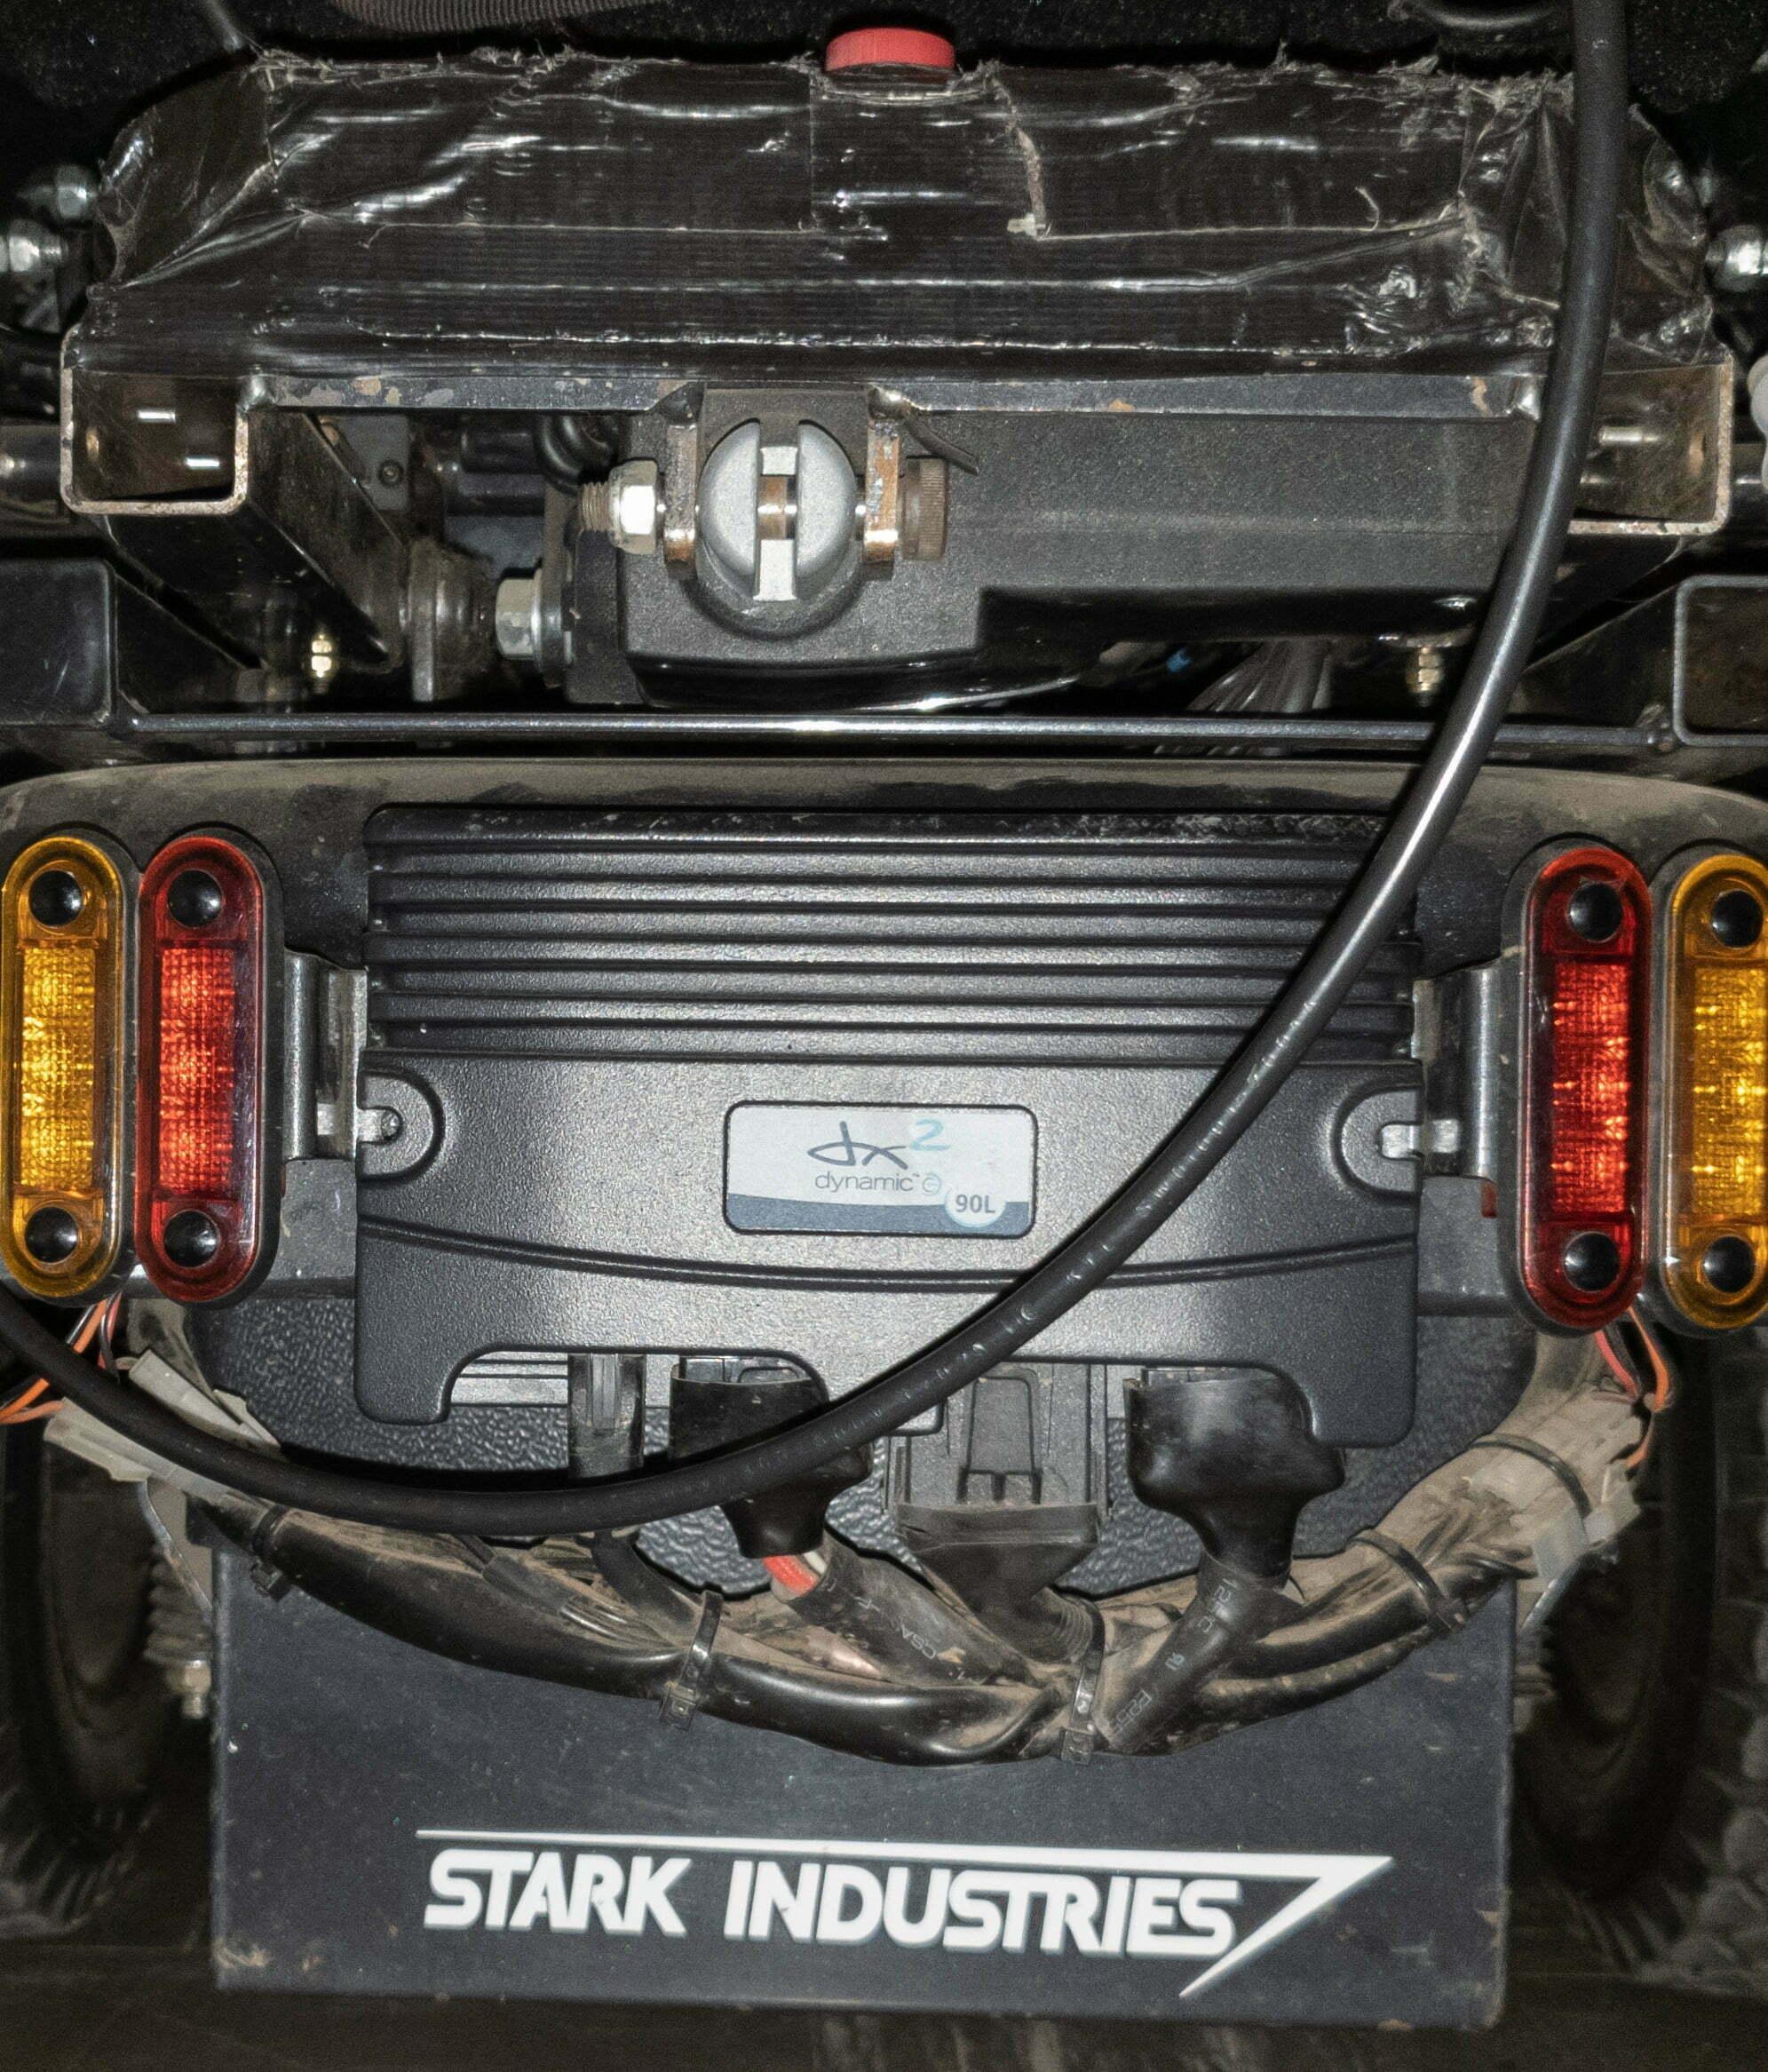 DX2 power module on frontier X5 wheelchair